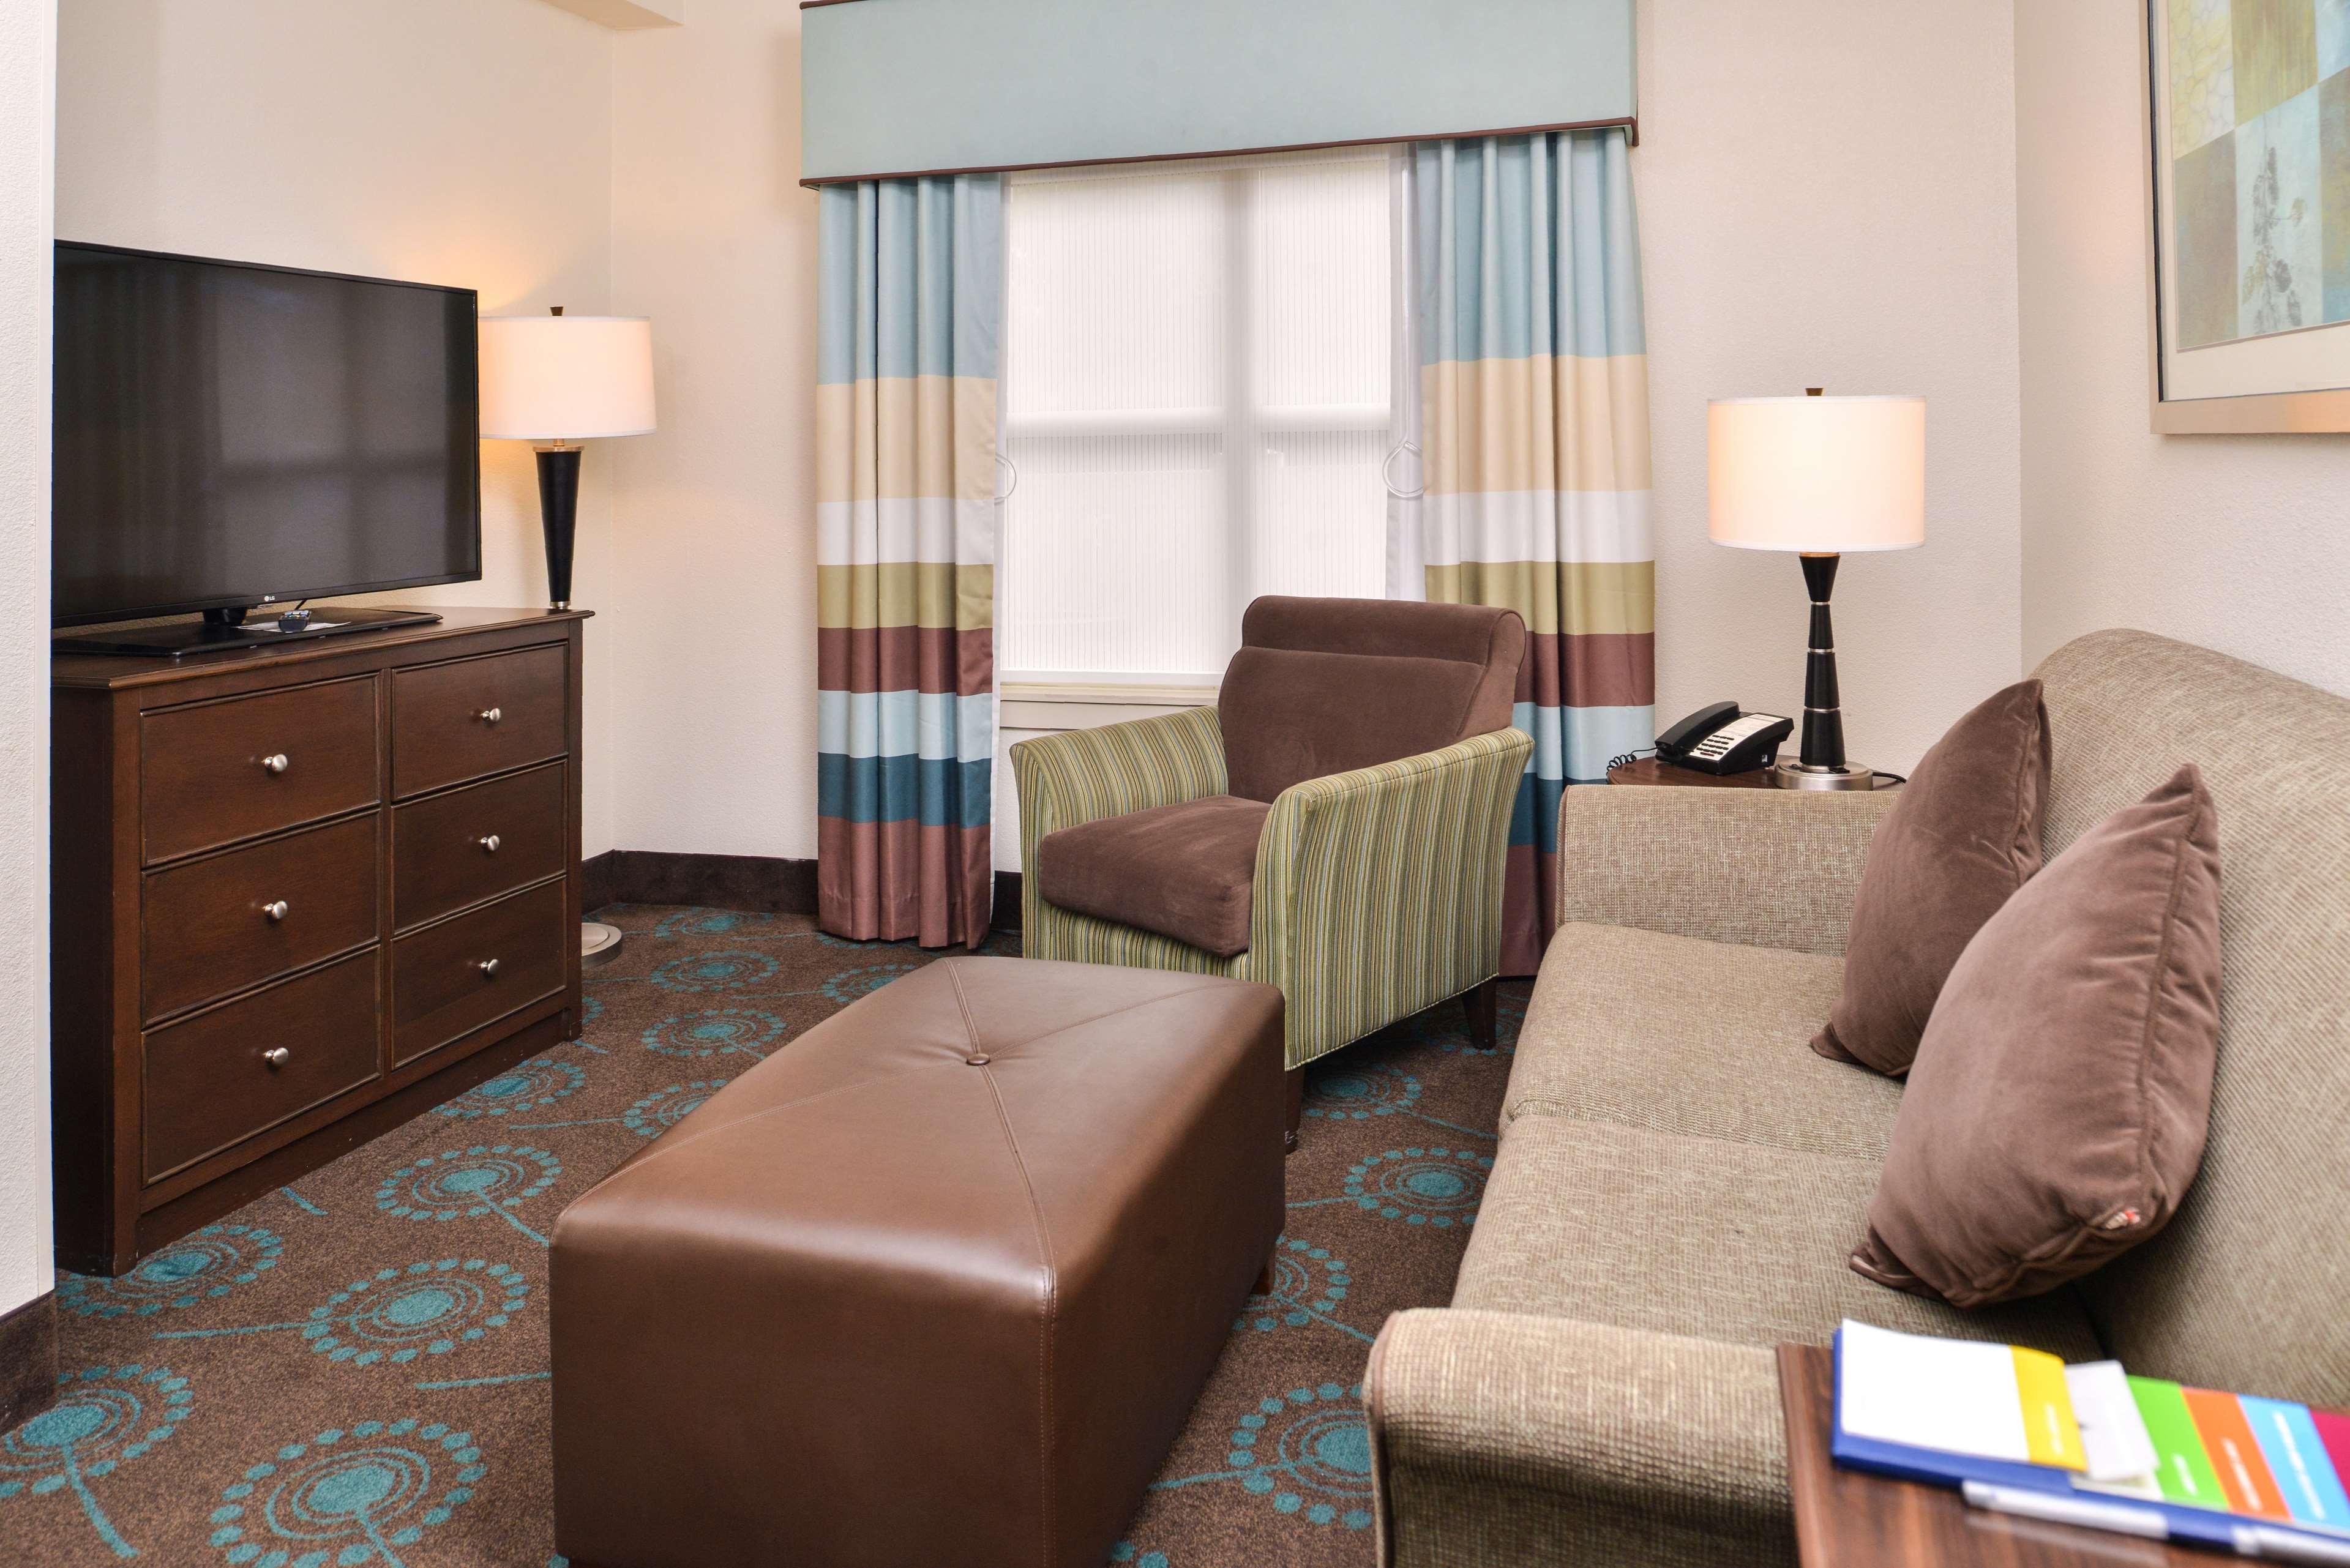 Hampton Inn & Suites Newport News (Oyster Point) image 17